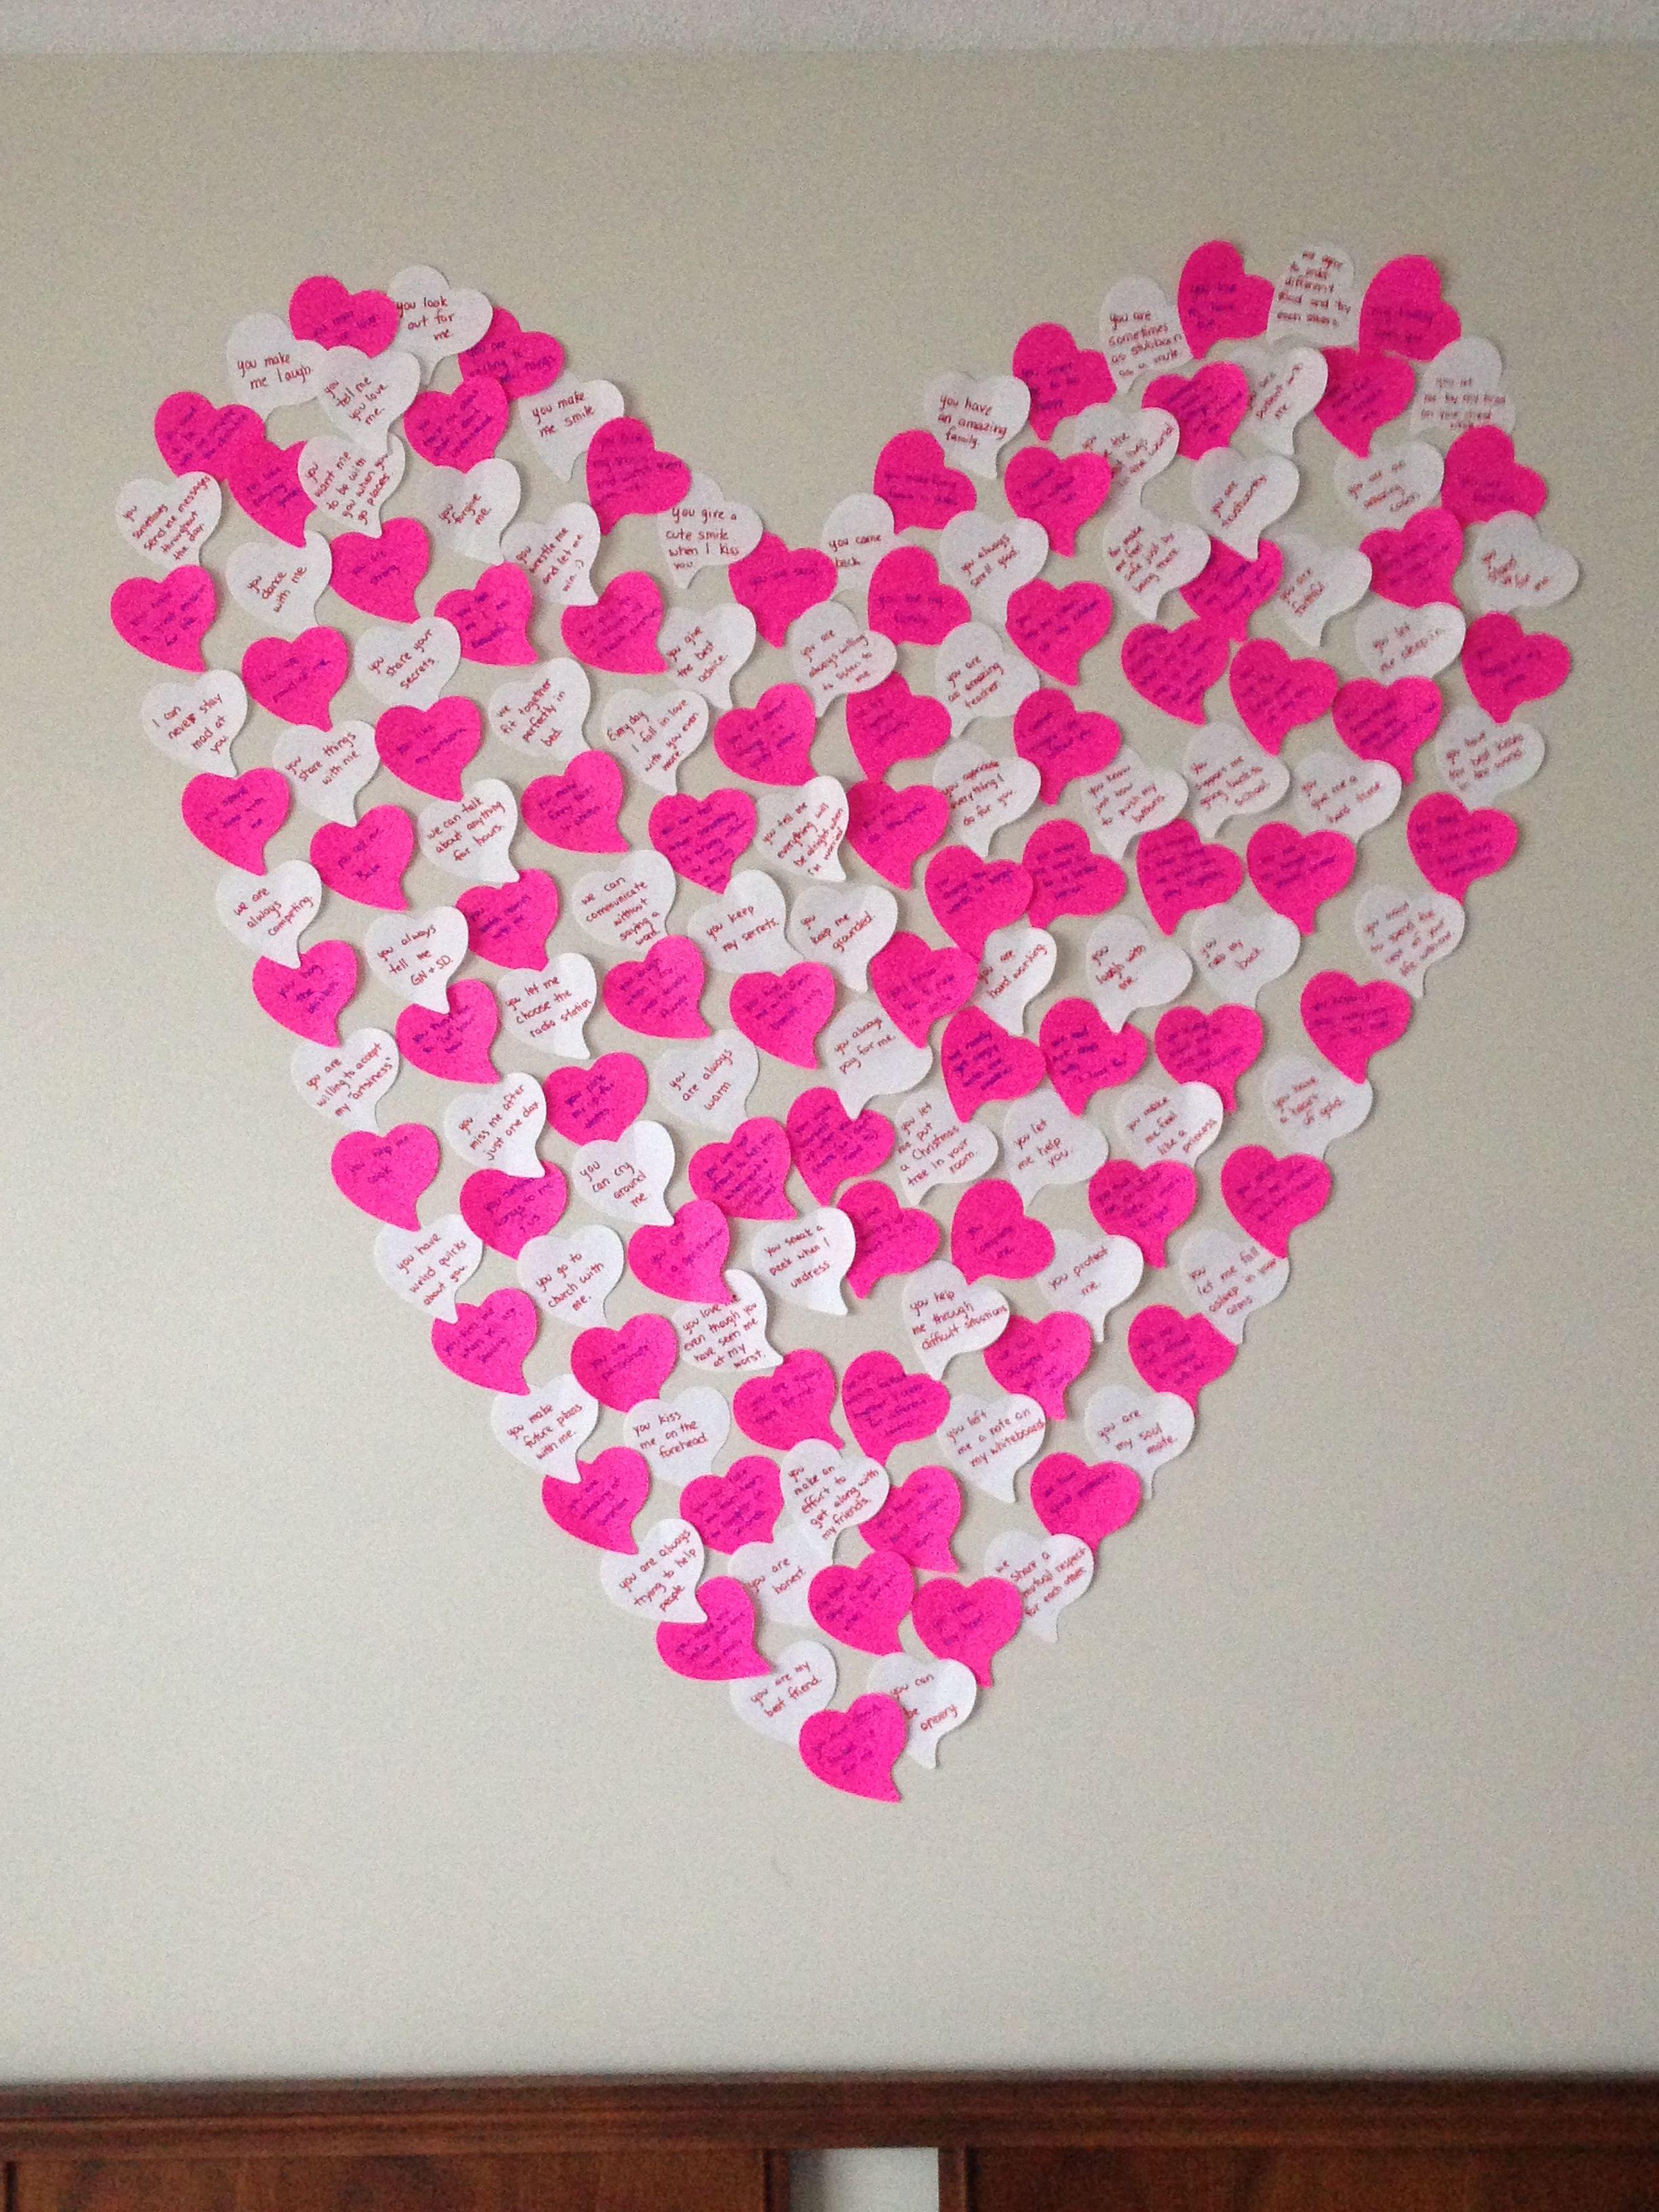 150 reasons I love my boyfriend. Used heart shaped stickies. I ...